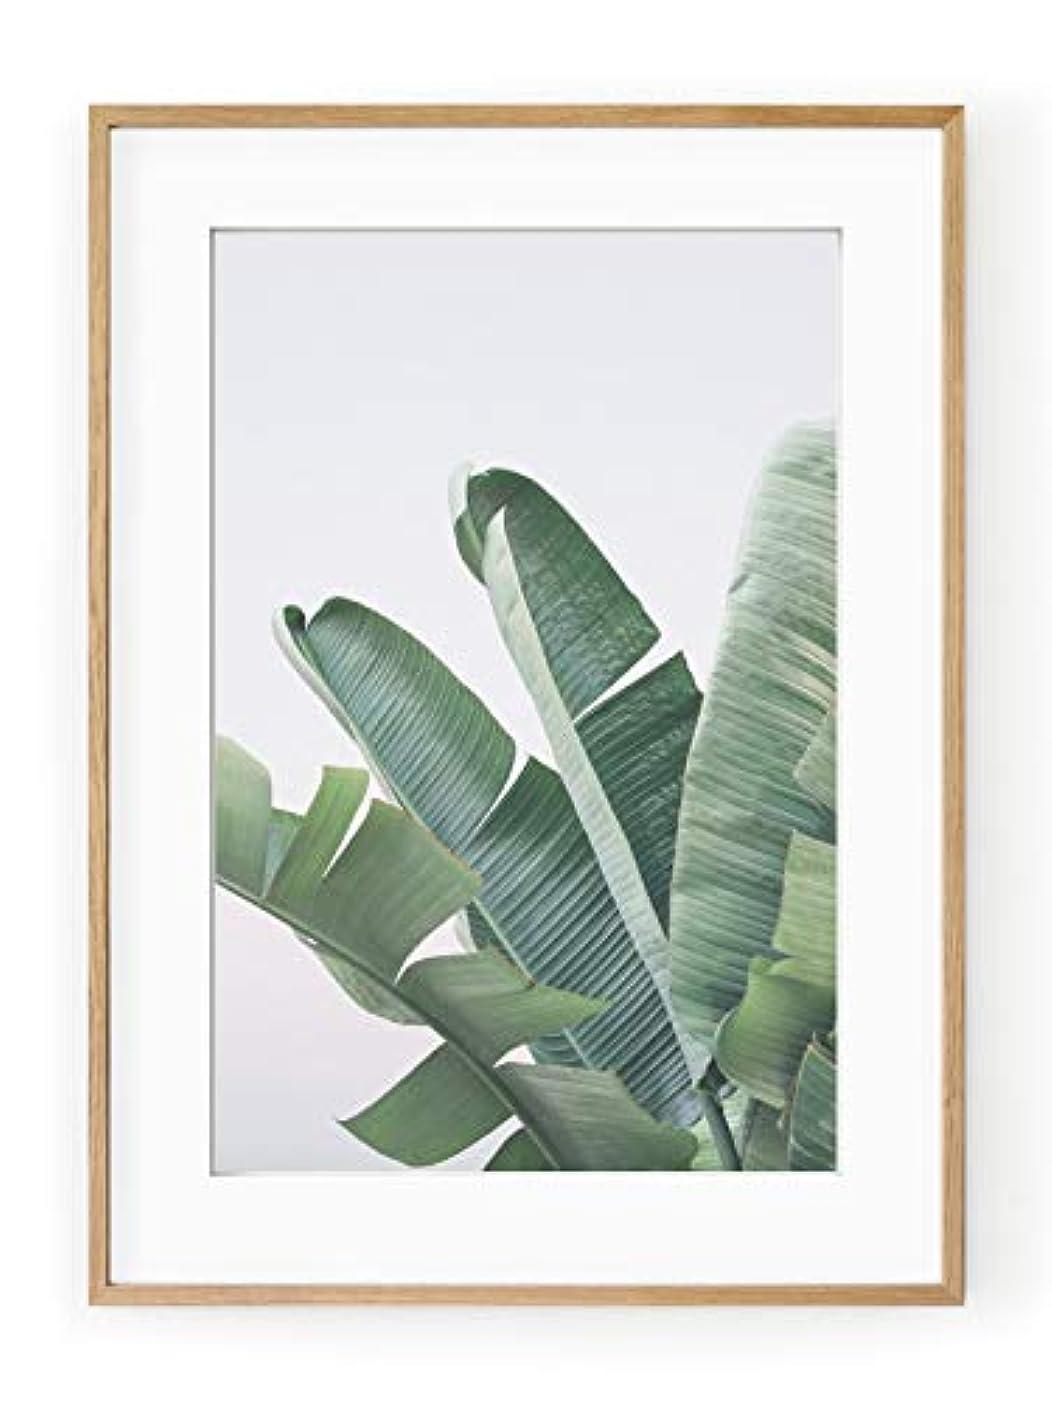 Banana Leaves Black Satin Aluminium Frame with Mount, Multicolored, 40x50